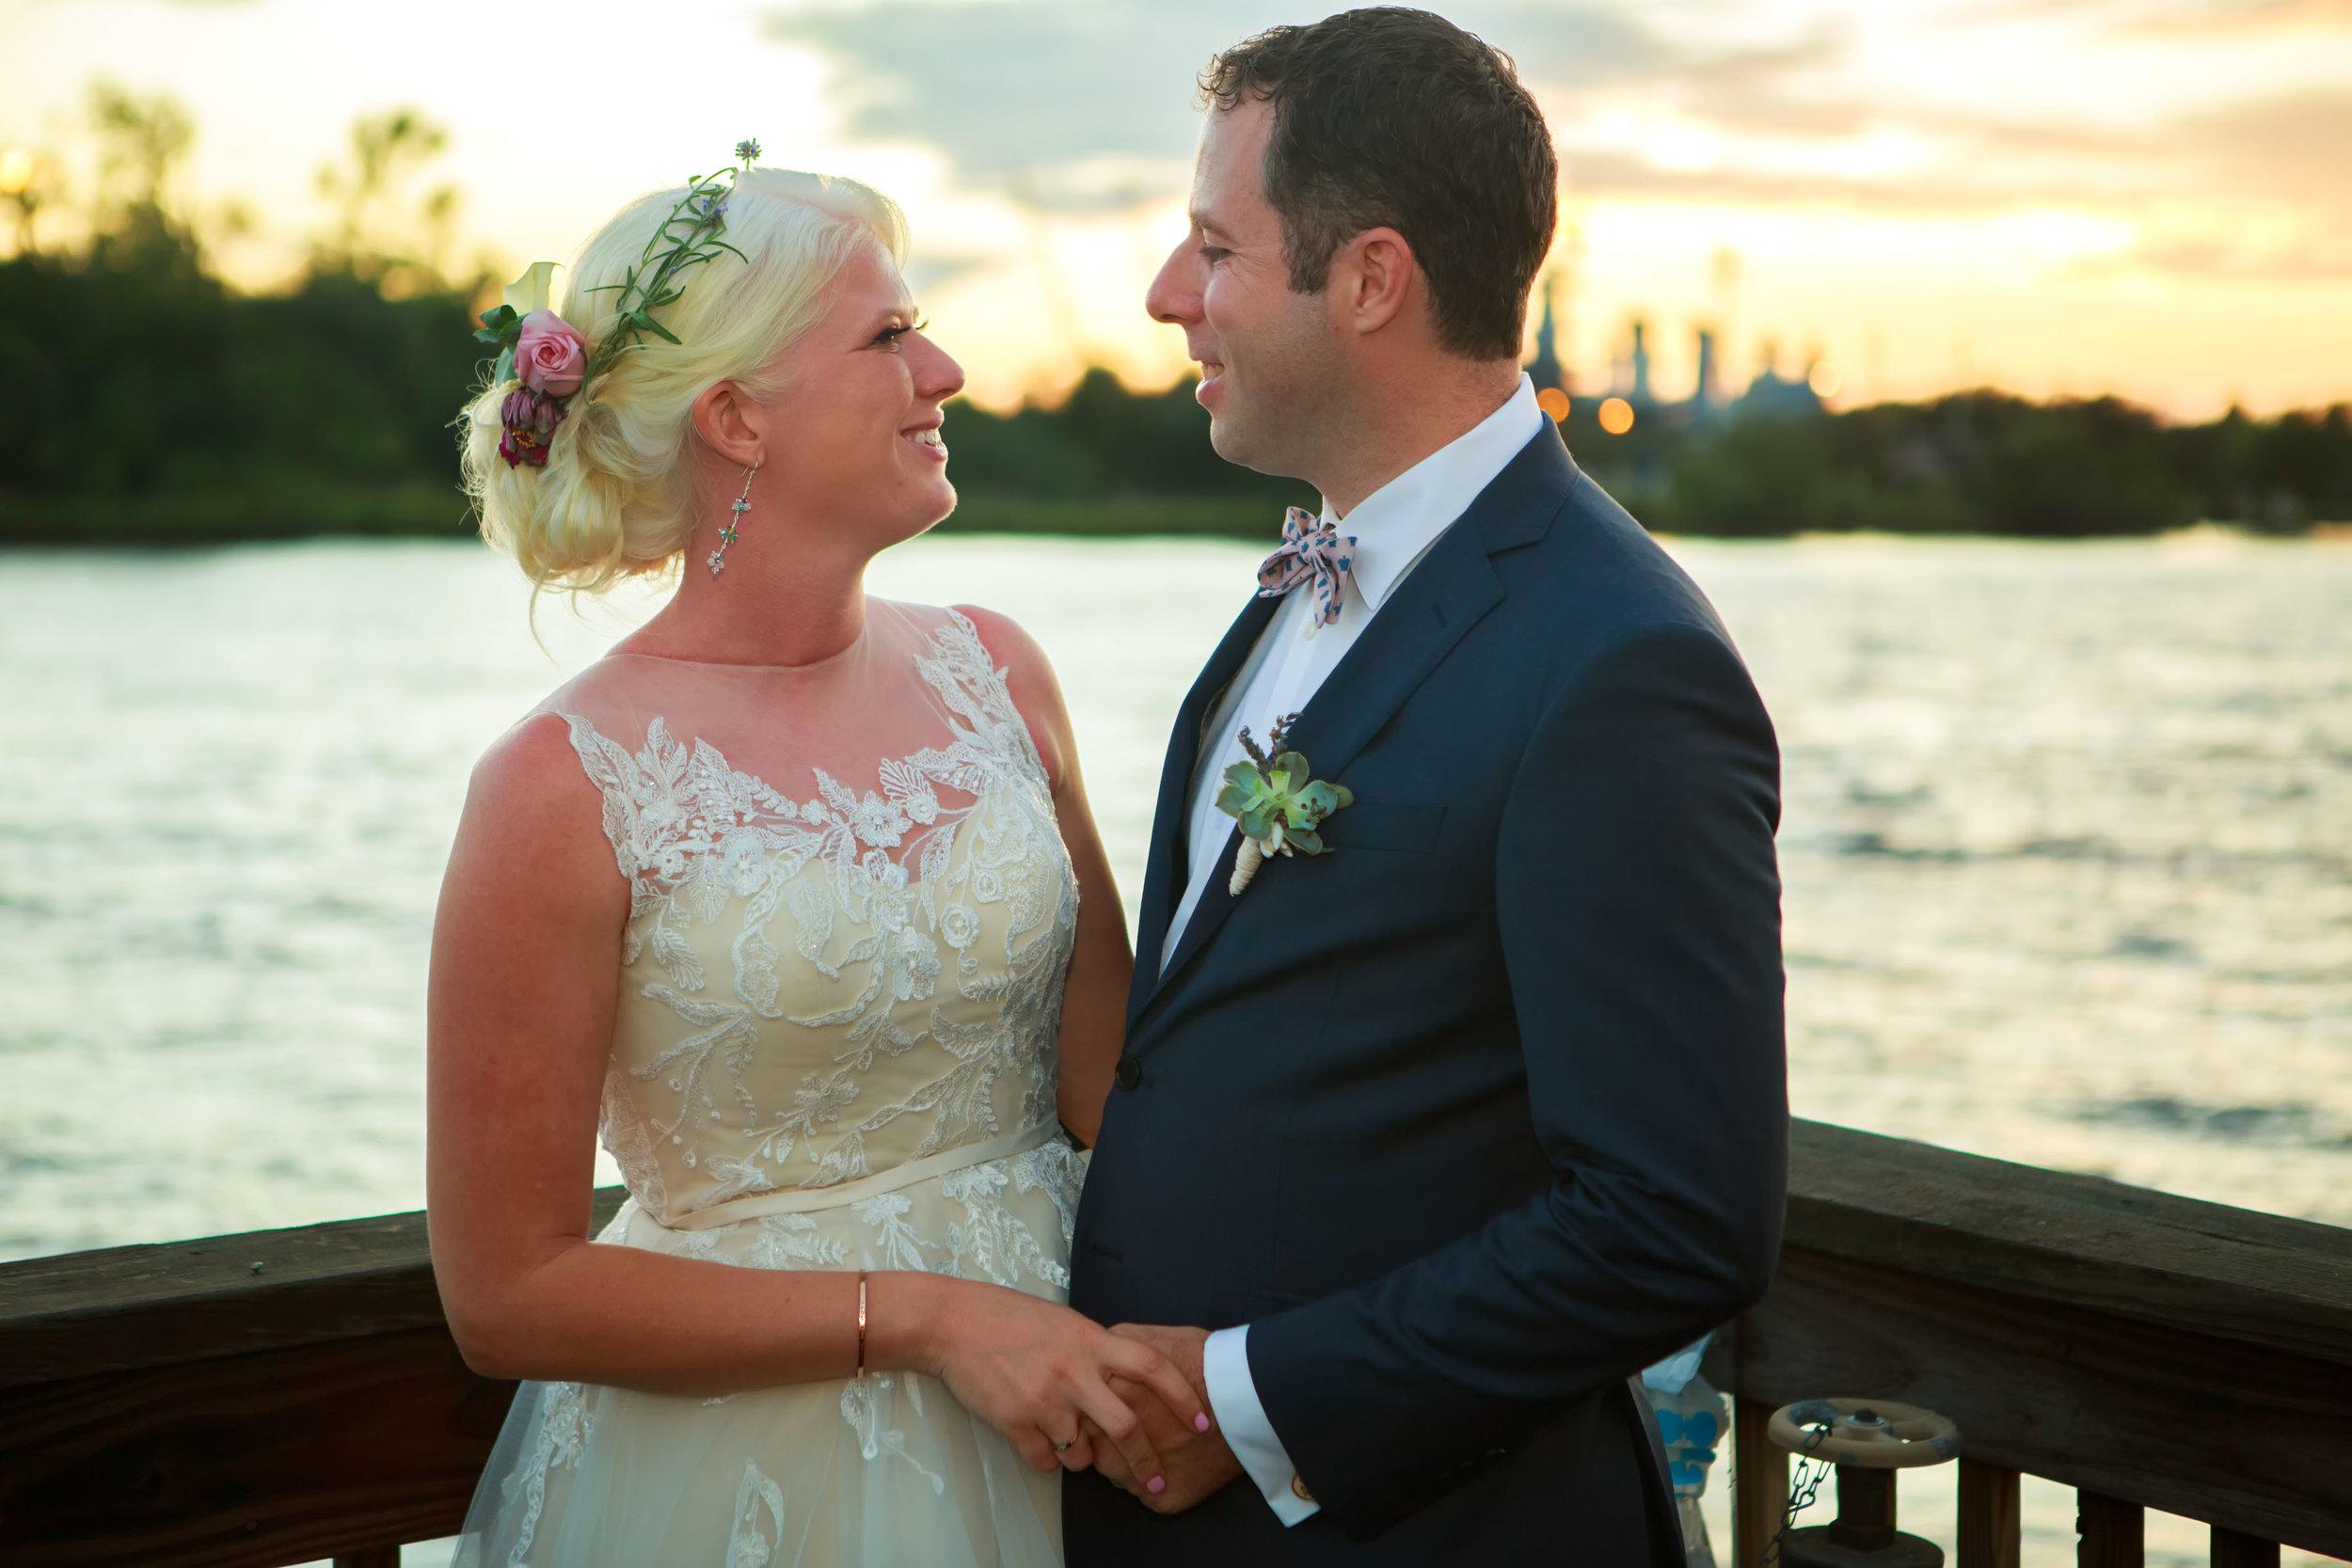 128-South-Wedding-Tiffany-Abruzzo-Photography-Bride-&-Groom-58.jpg